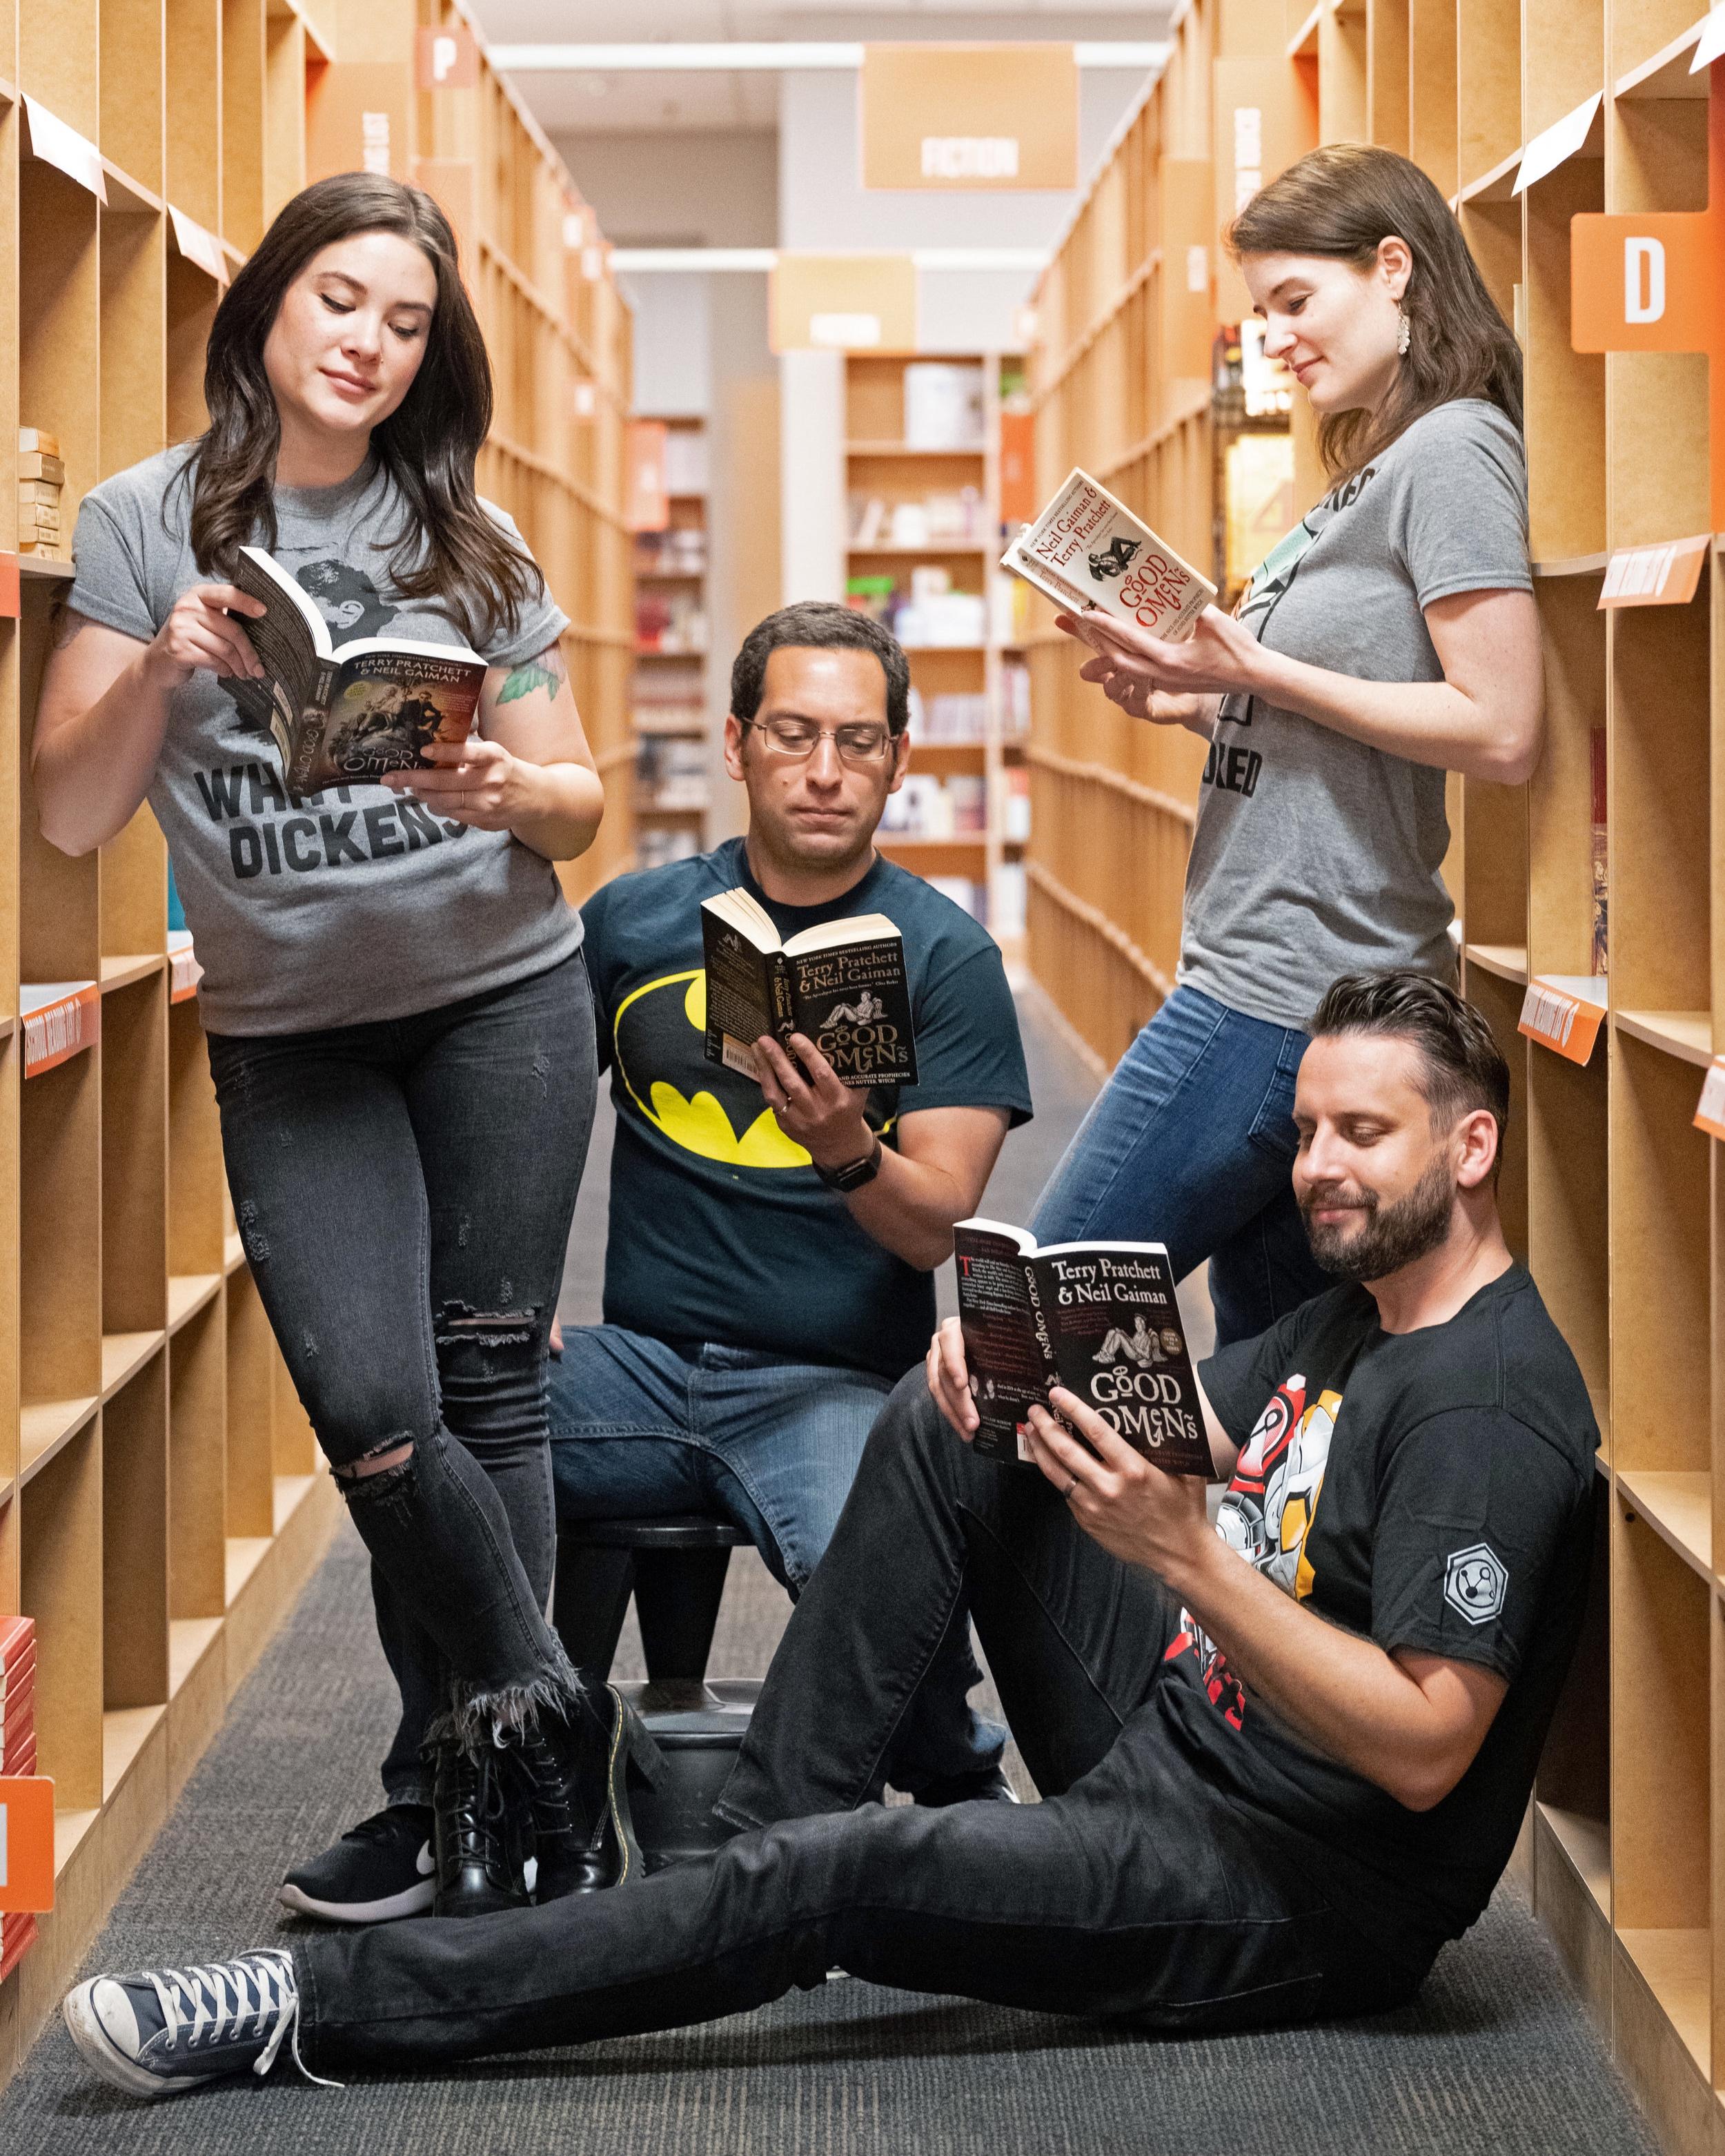 The Geekward! Team: (L-R) Talia, Adam, Christy & Lucas